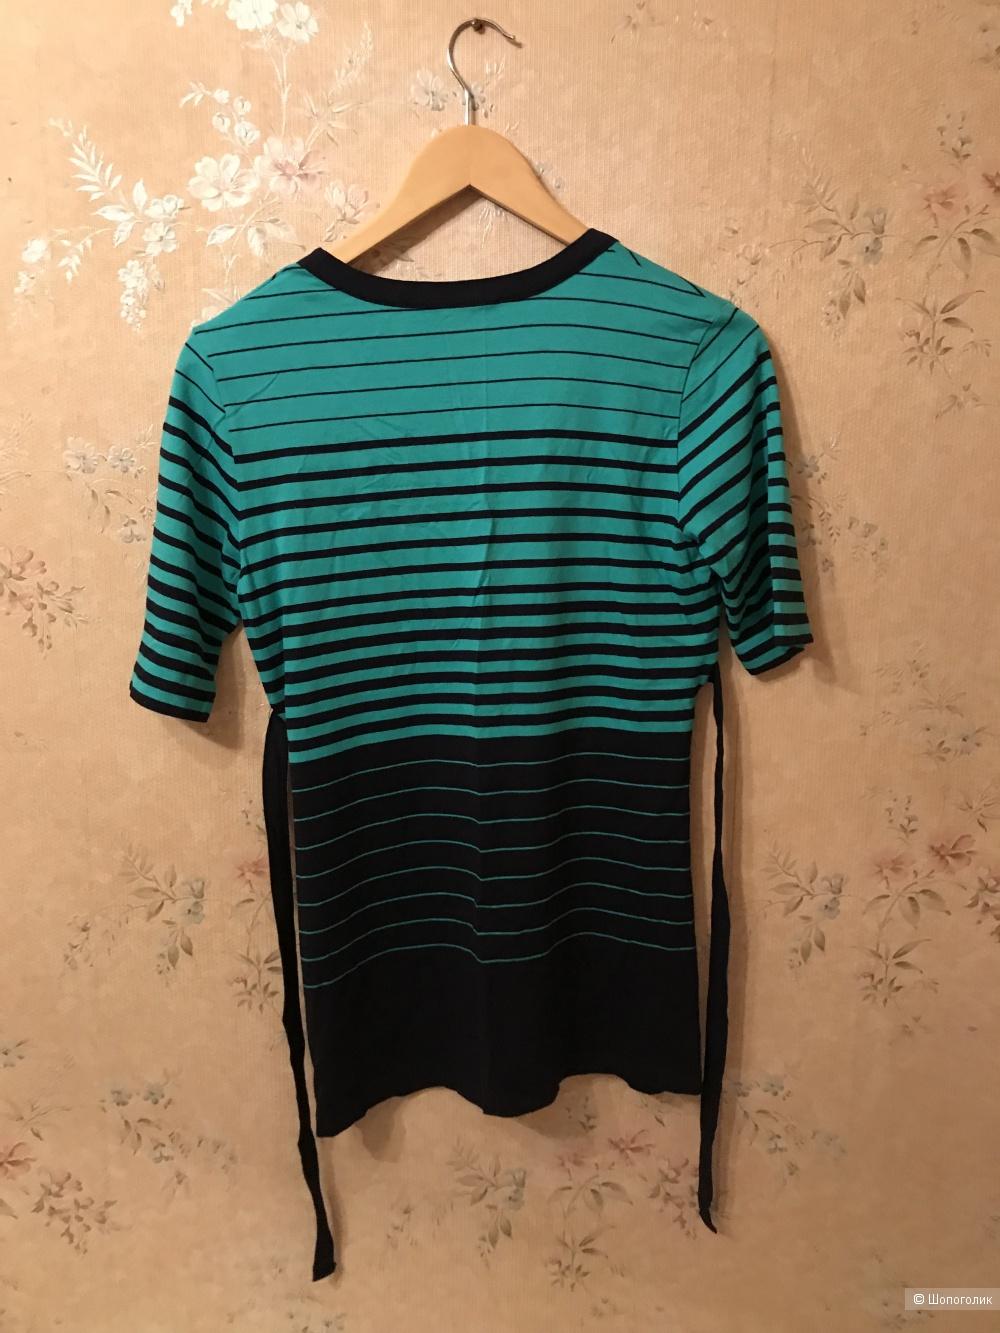 Комплектом блузка Betty Barclay Collection\блузка No Name,46 рус